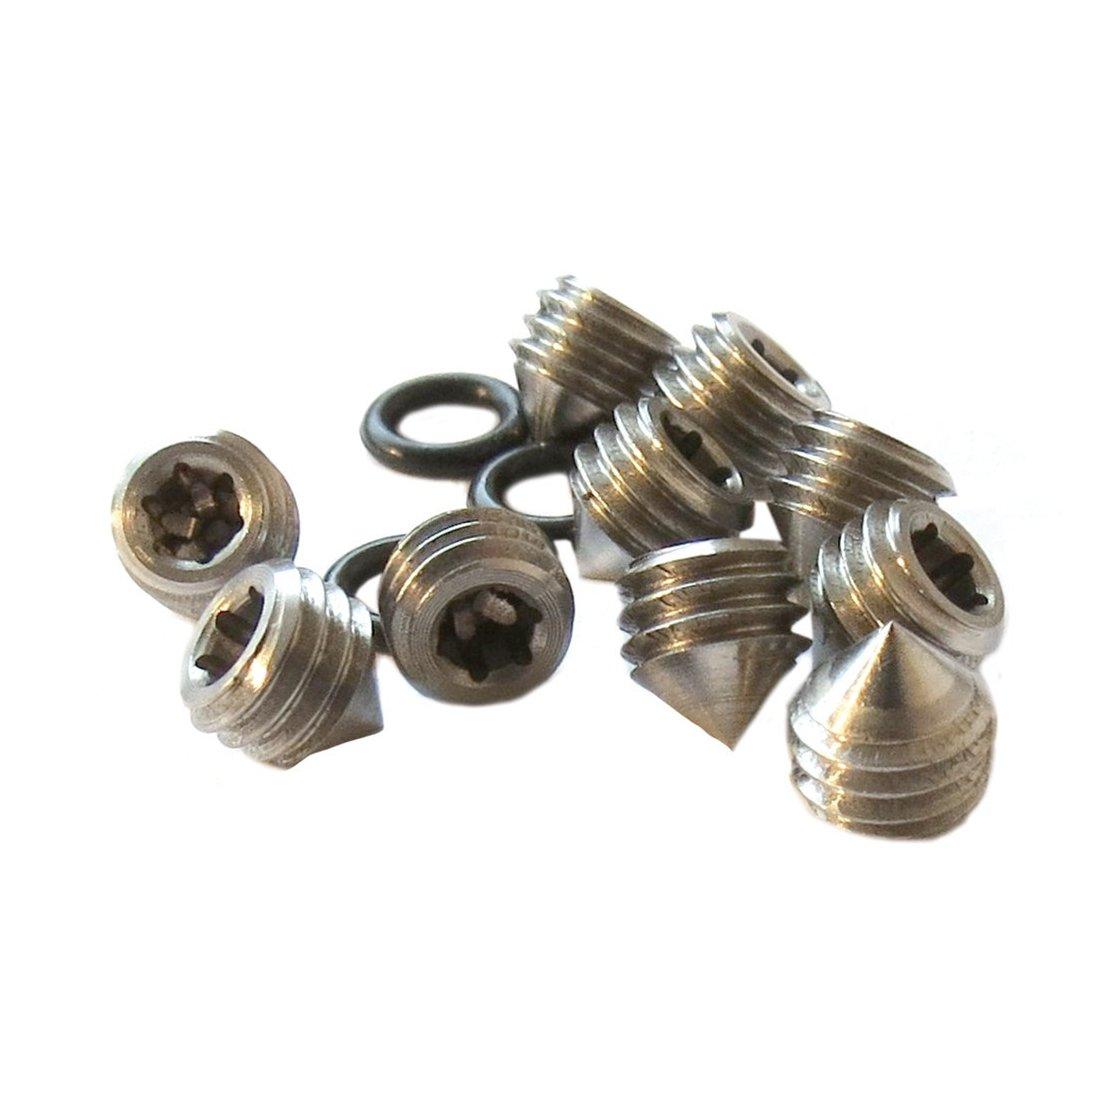 50pcs Durable Fishing Drillinge Abdeckungen Fall Bonnets Caps Schutz Set Neu 2U